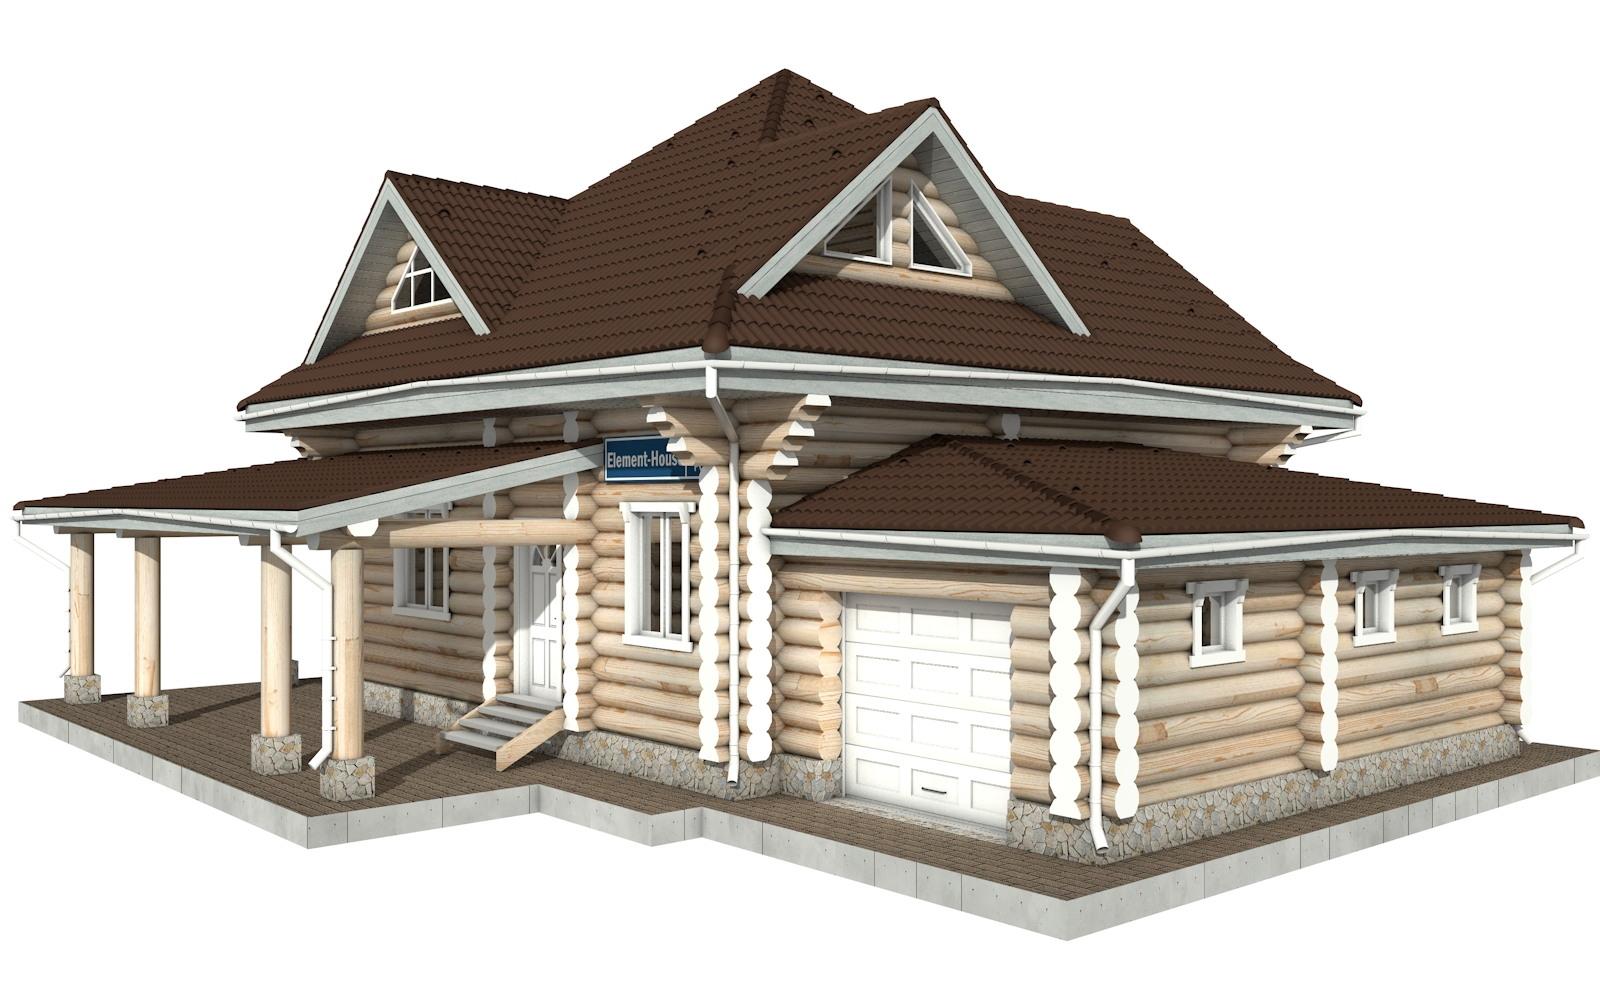 РС-112 - Проект дома из бревна с мансардой